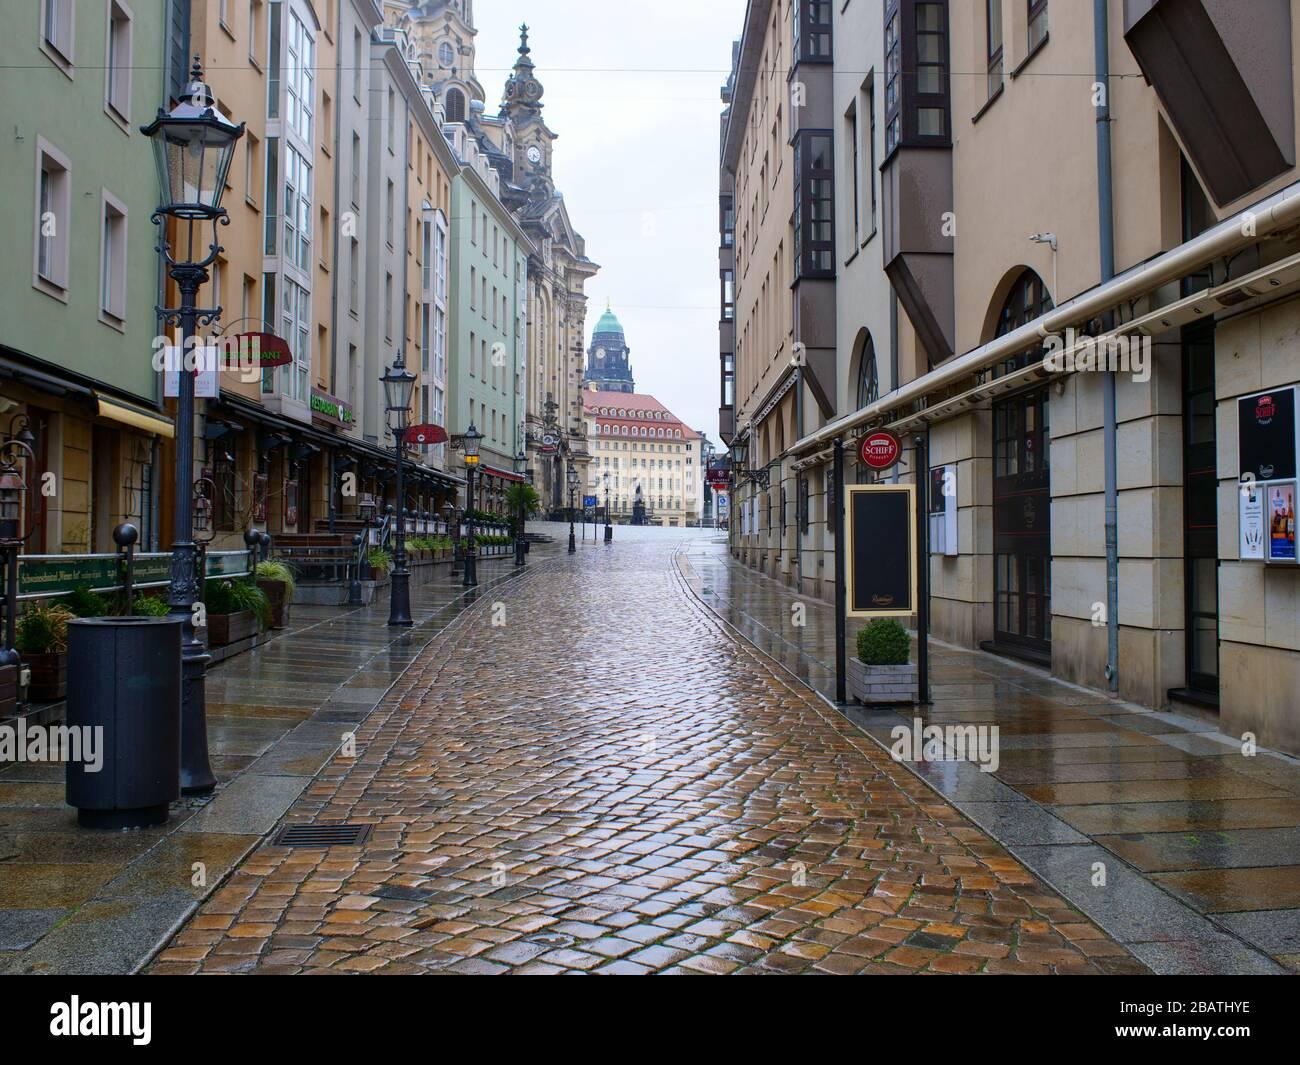 Dresden Kneipenmeile Münzgasse in der Altstadt bei Regen während Coronavirus Lockdown 2020 COVID-19 Gastronomie Restaurants Stock Photo